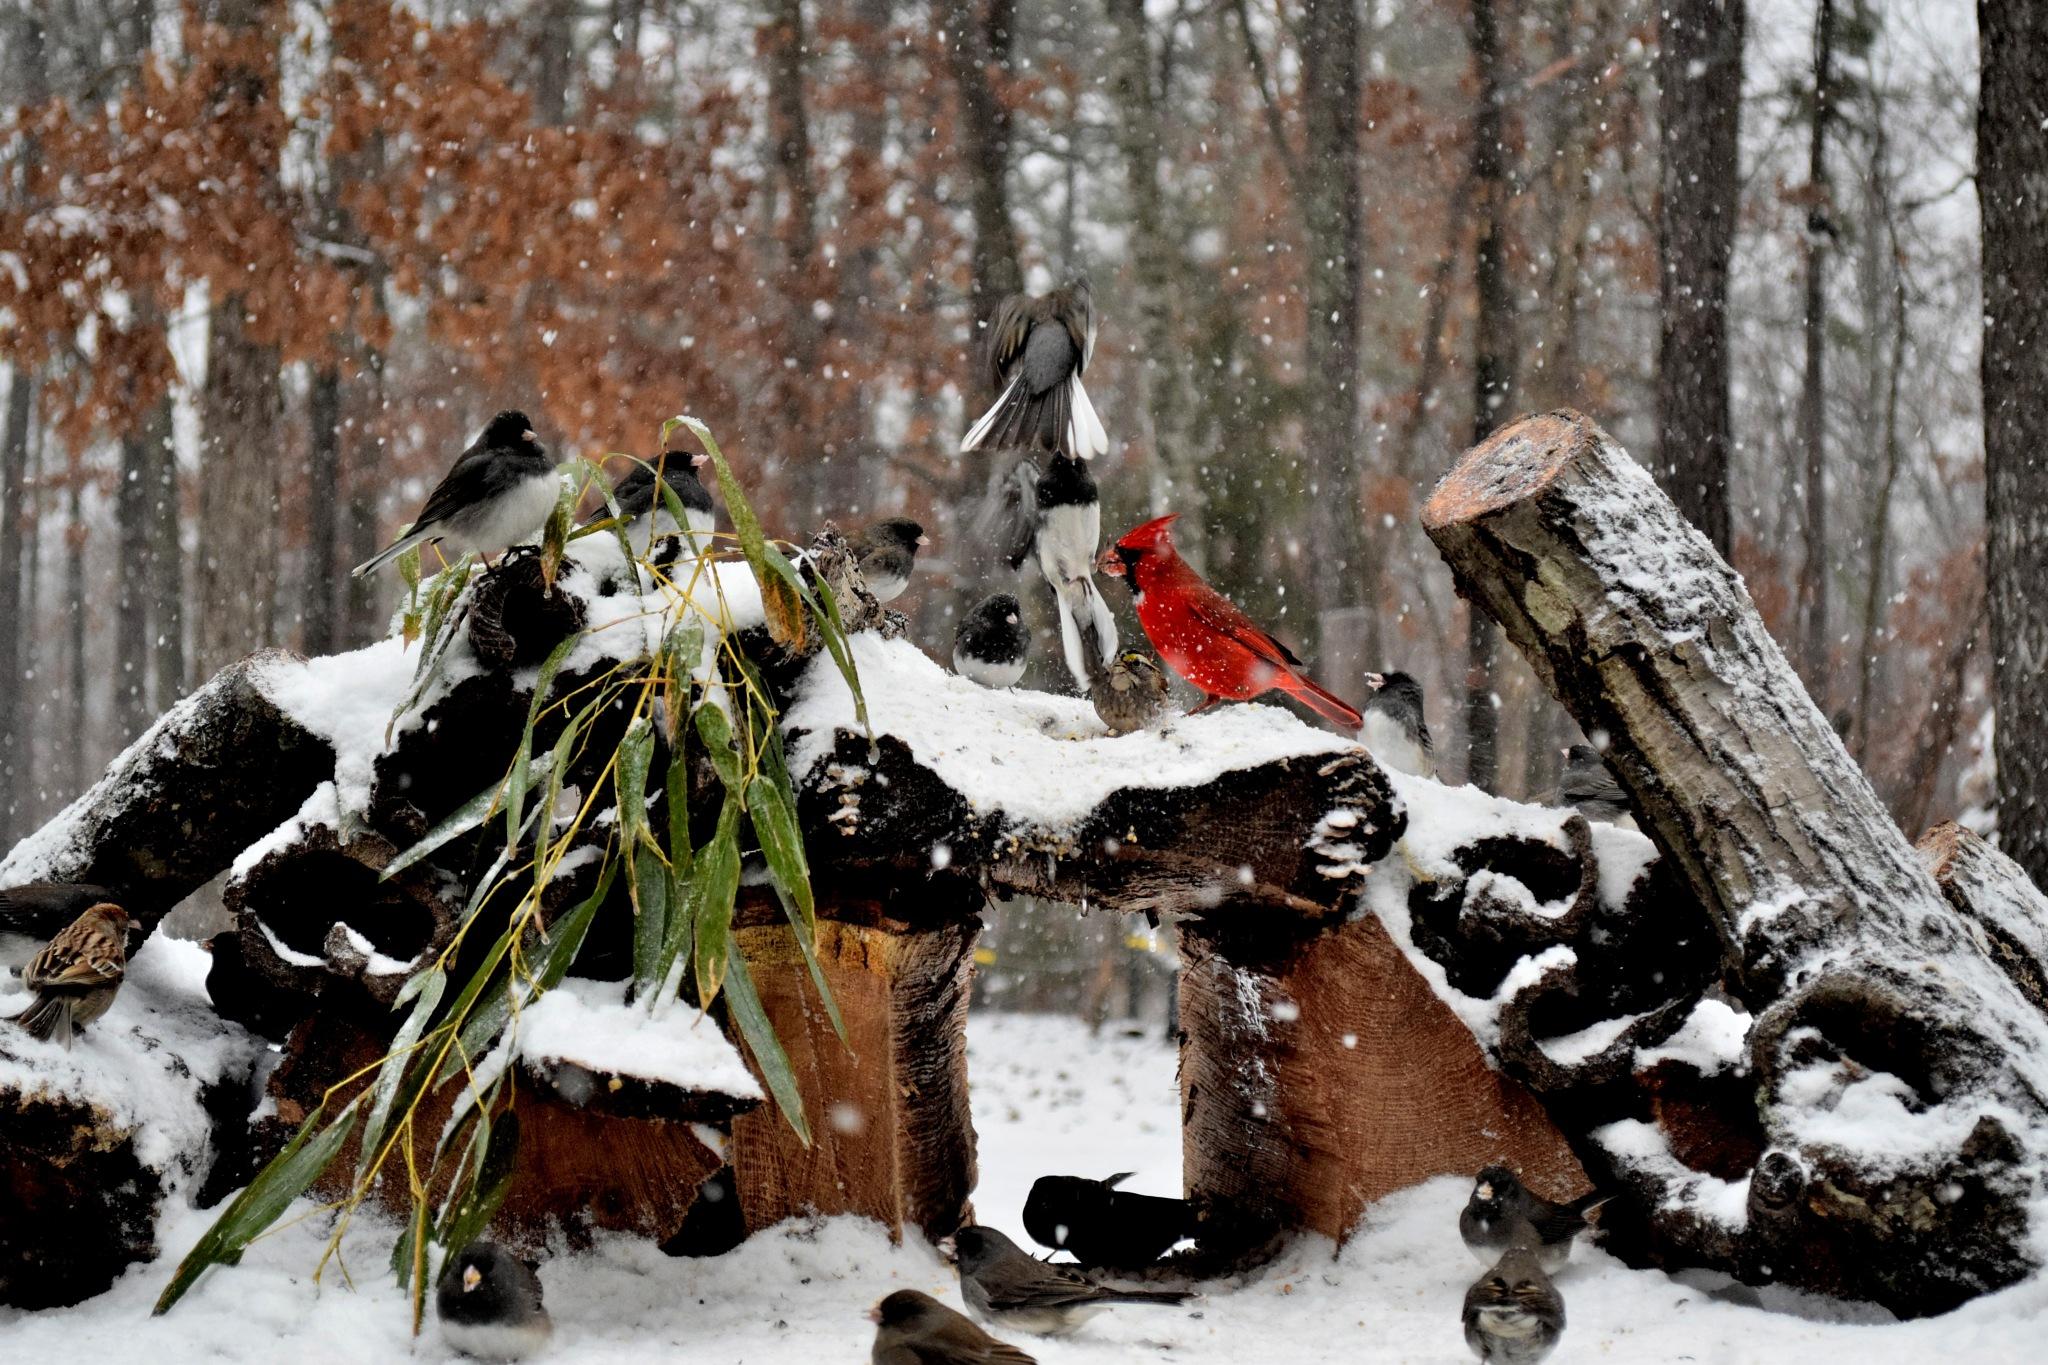 Nature's Birds 154~Snowy Days 4 by Lawrence Scott Hess